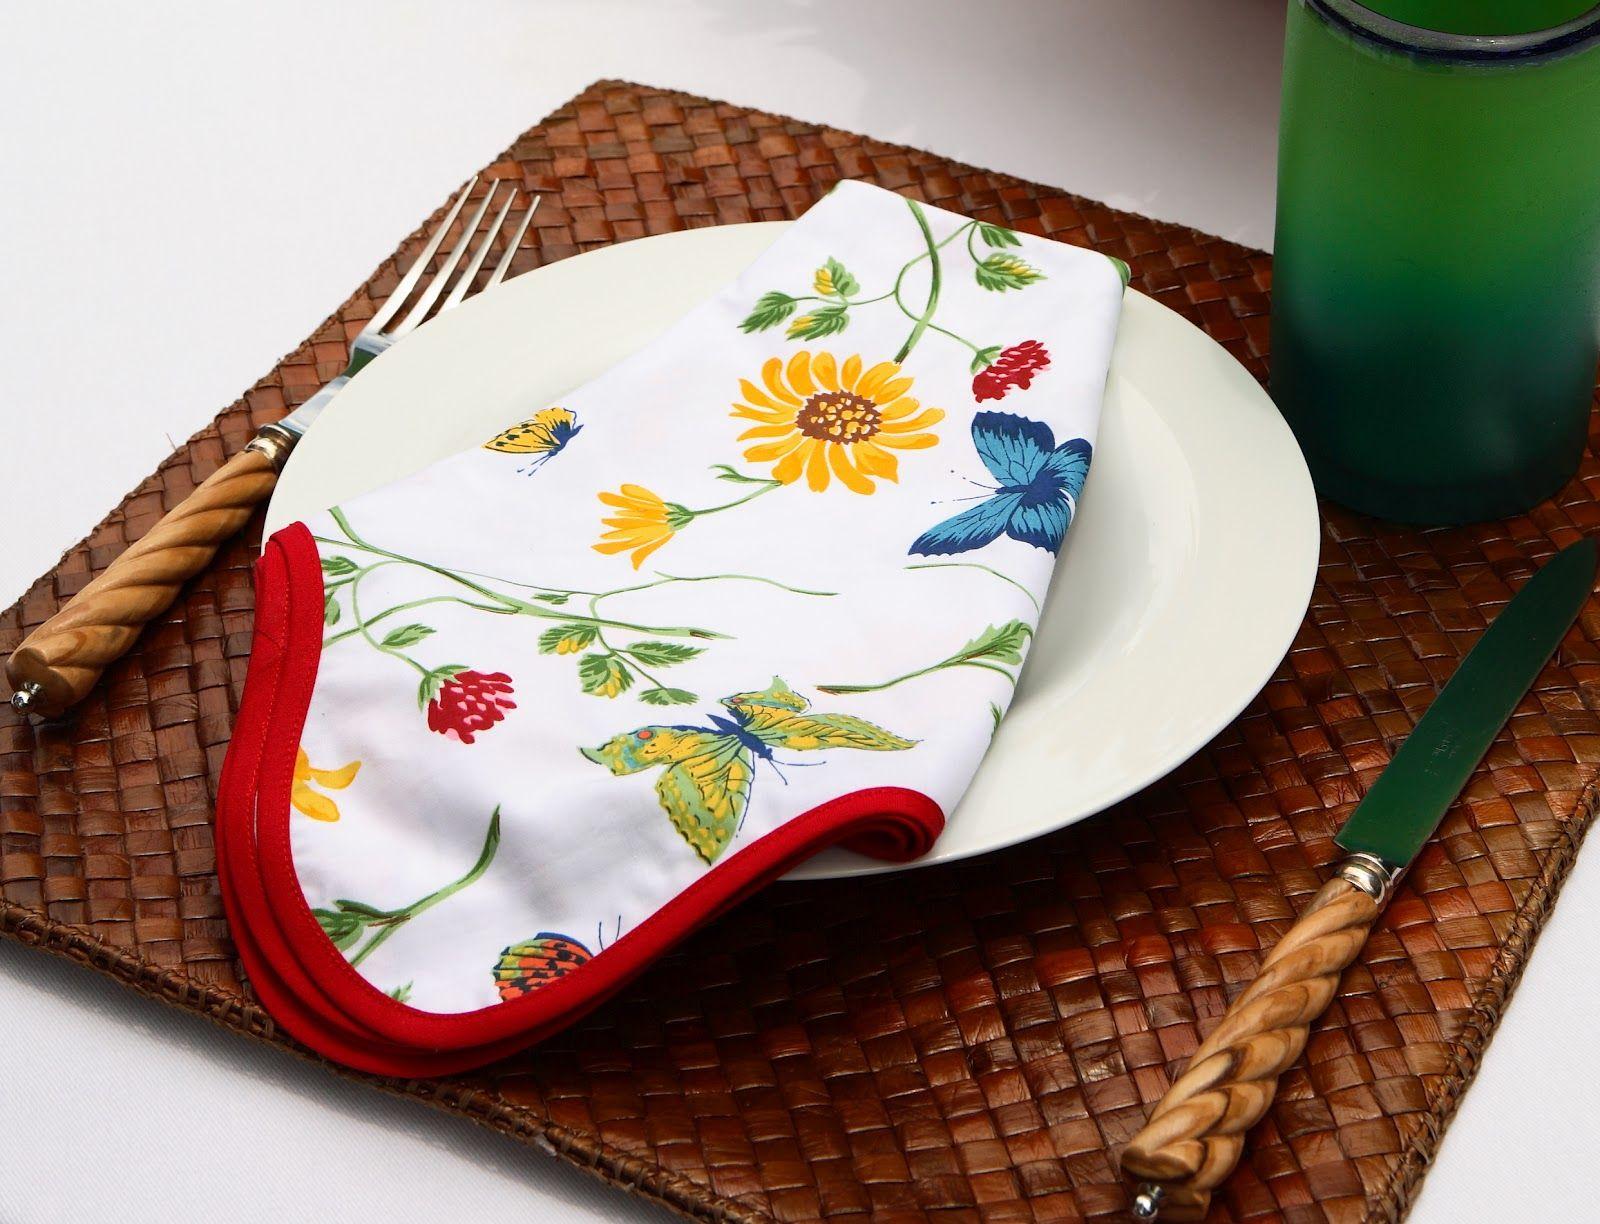 Colorful napkins for al fresco meals - D. Porthault